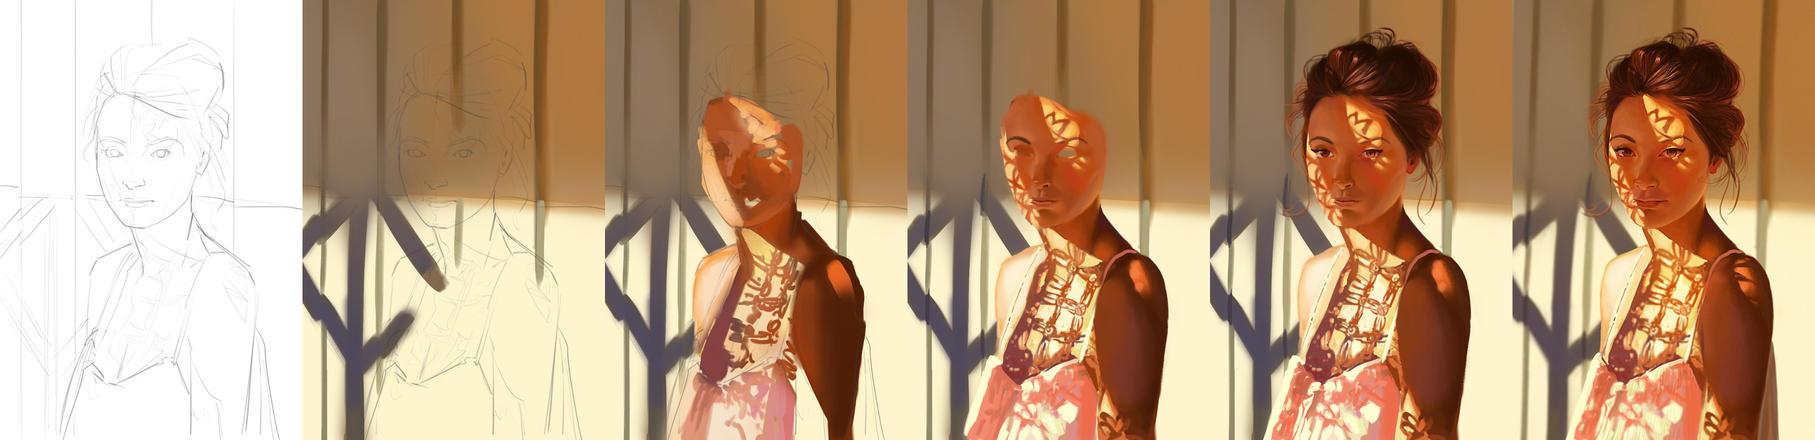 Girl under pattern - steps by ChuchuaN